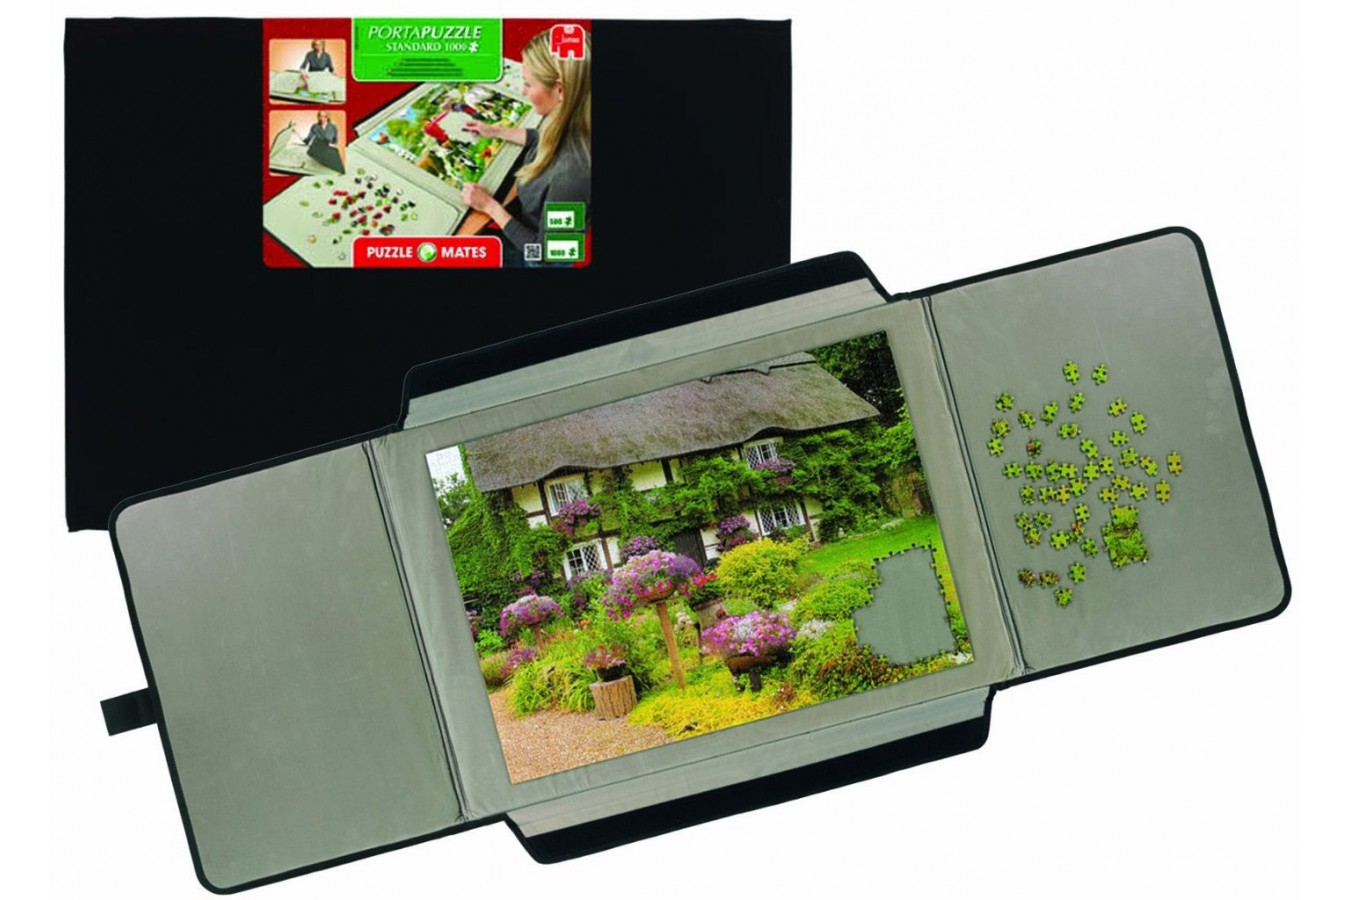 Portapuzzle - Suport pentru Puzzle 1000 Piese imagine